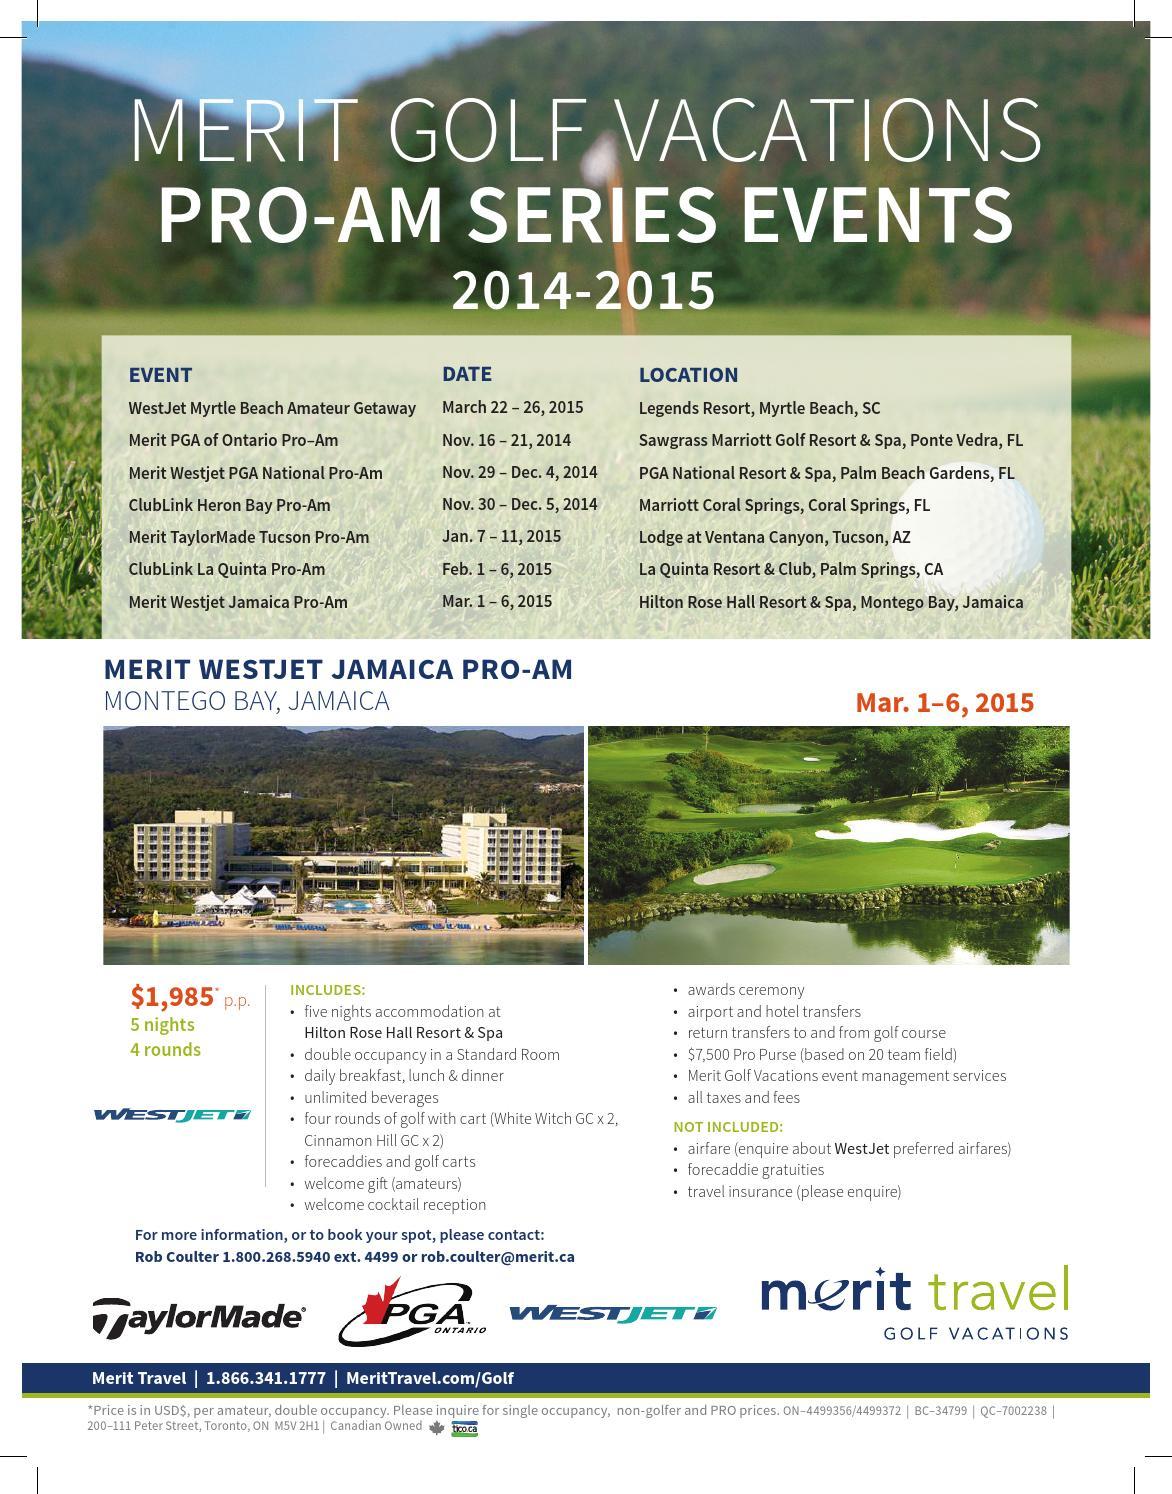 Merit Golf Vacaitons 2014-2015 Events by MERIT GOLF & SKI VACATIONS ...